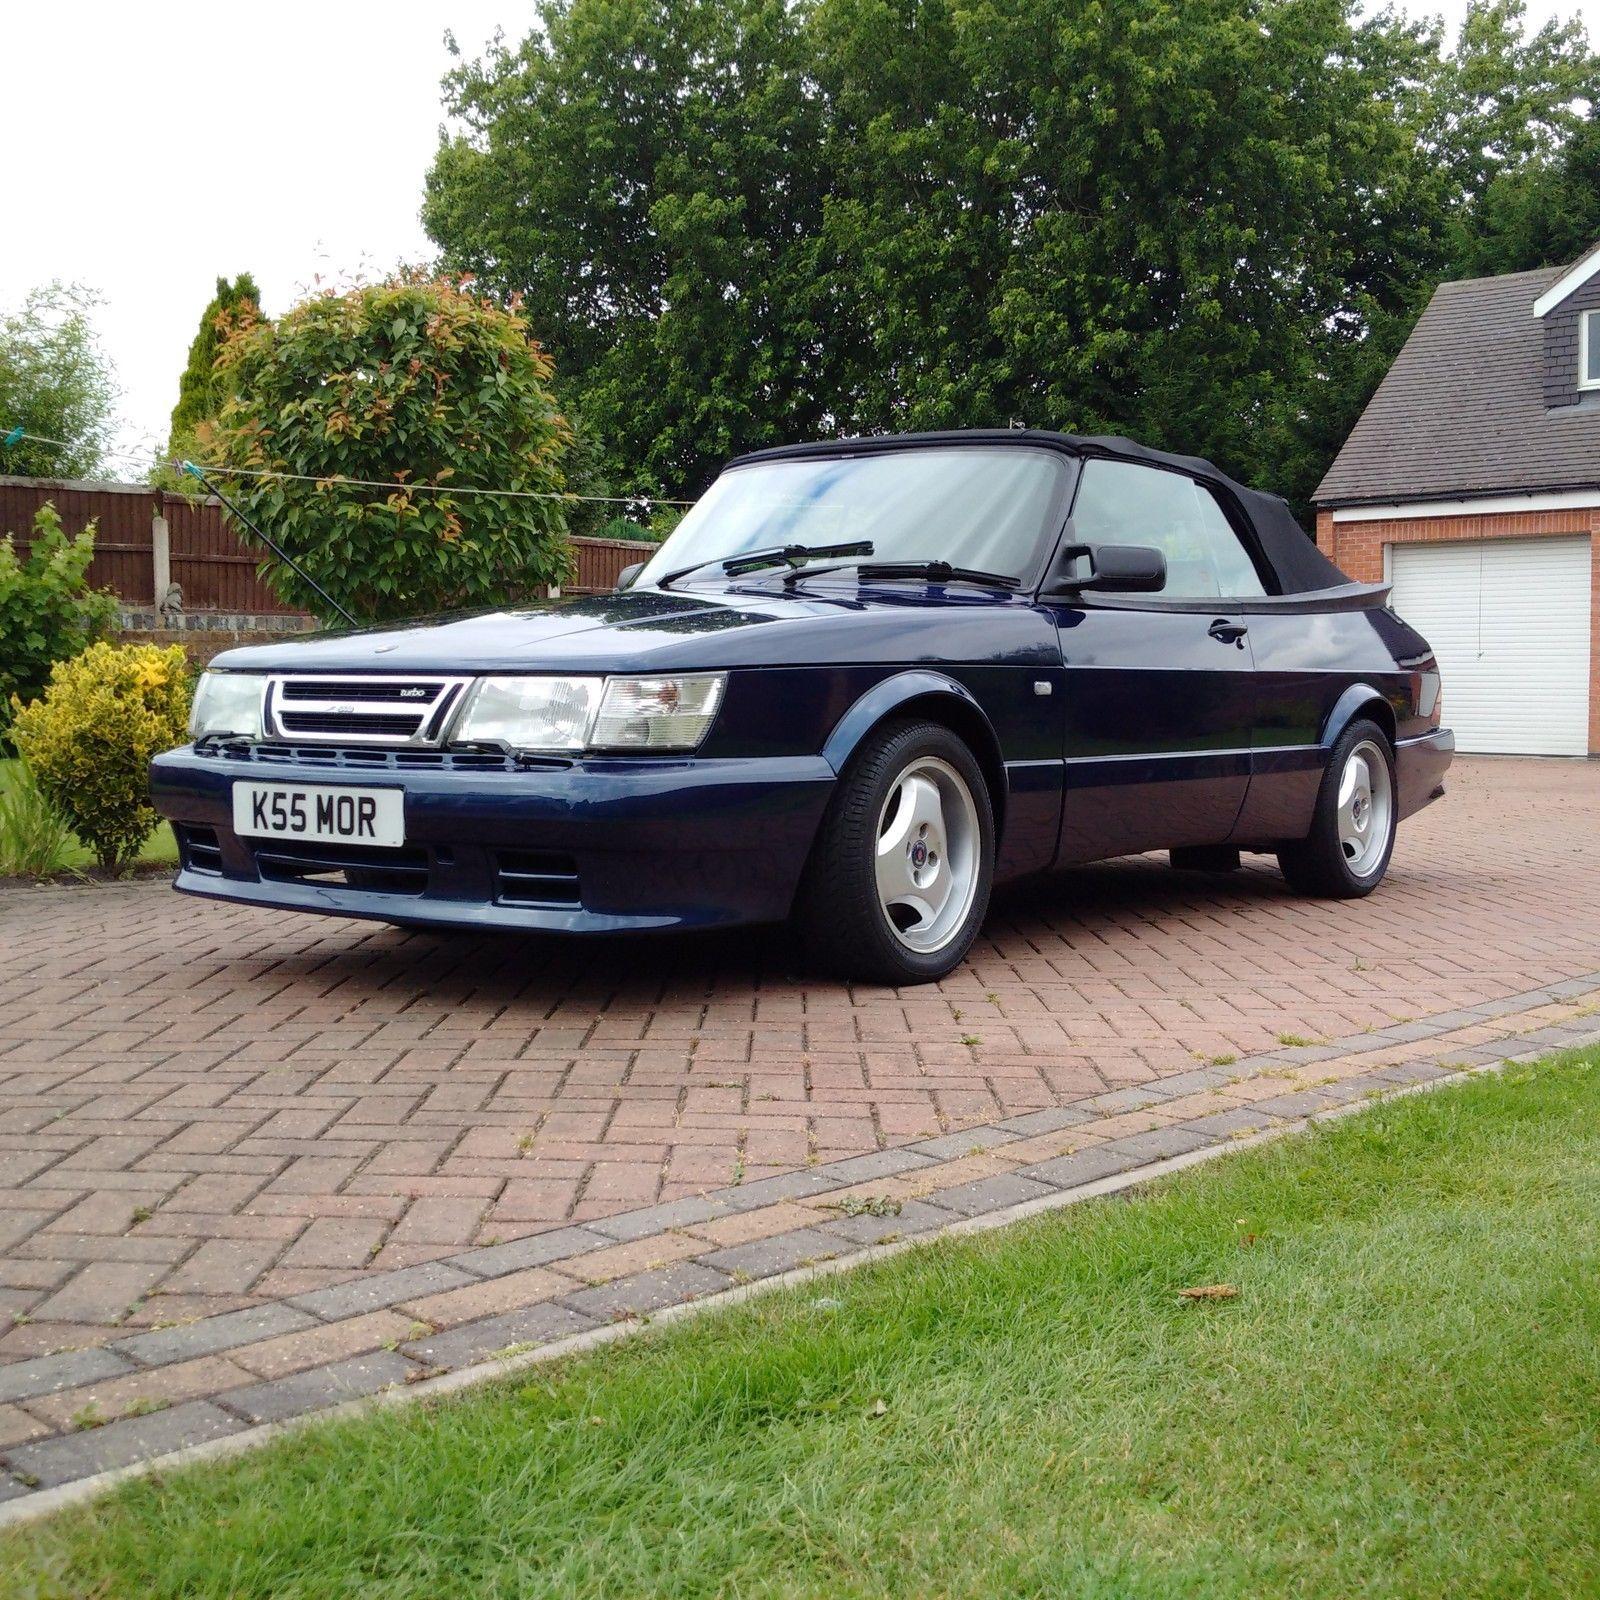 Super Rare Saab 900 Turbo Classic Convertible, Carlsson